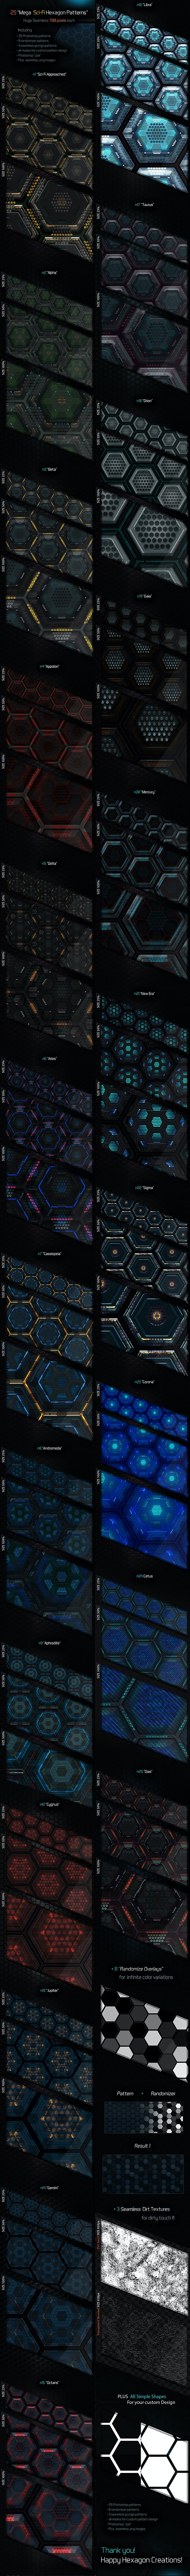 Mega Sci-Fi Hitech Hexagon Patterns - Techno / Futuristic Textures / Fills / Patterns